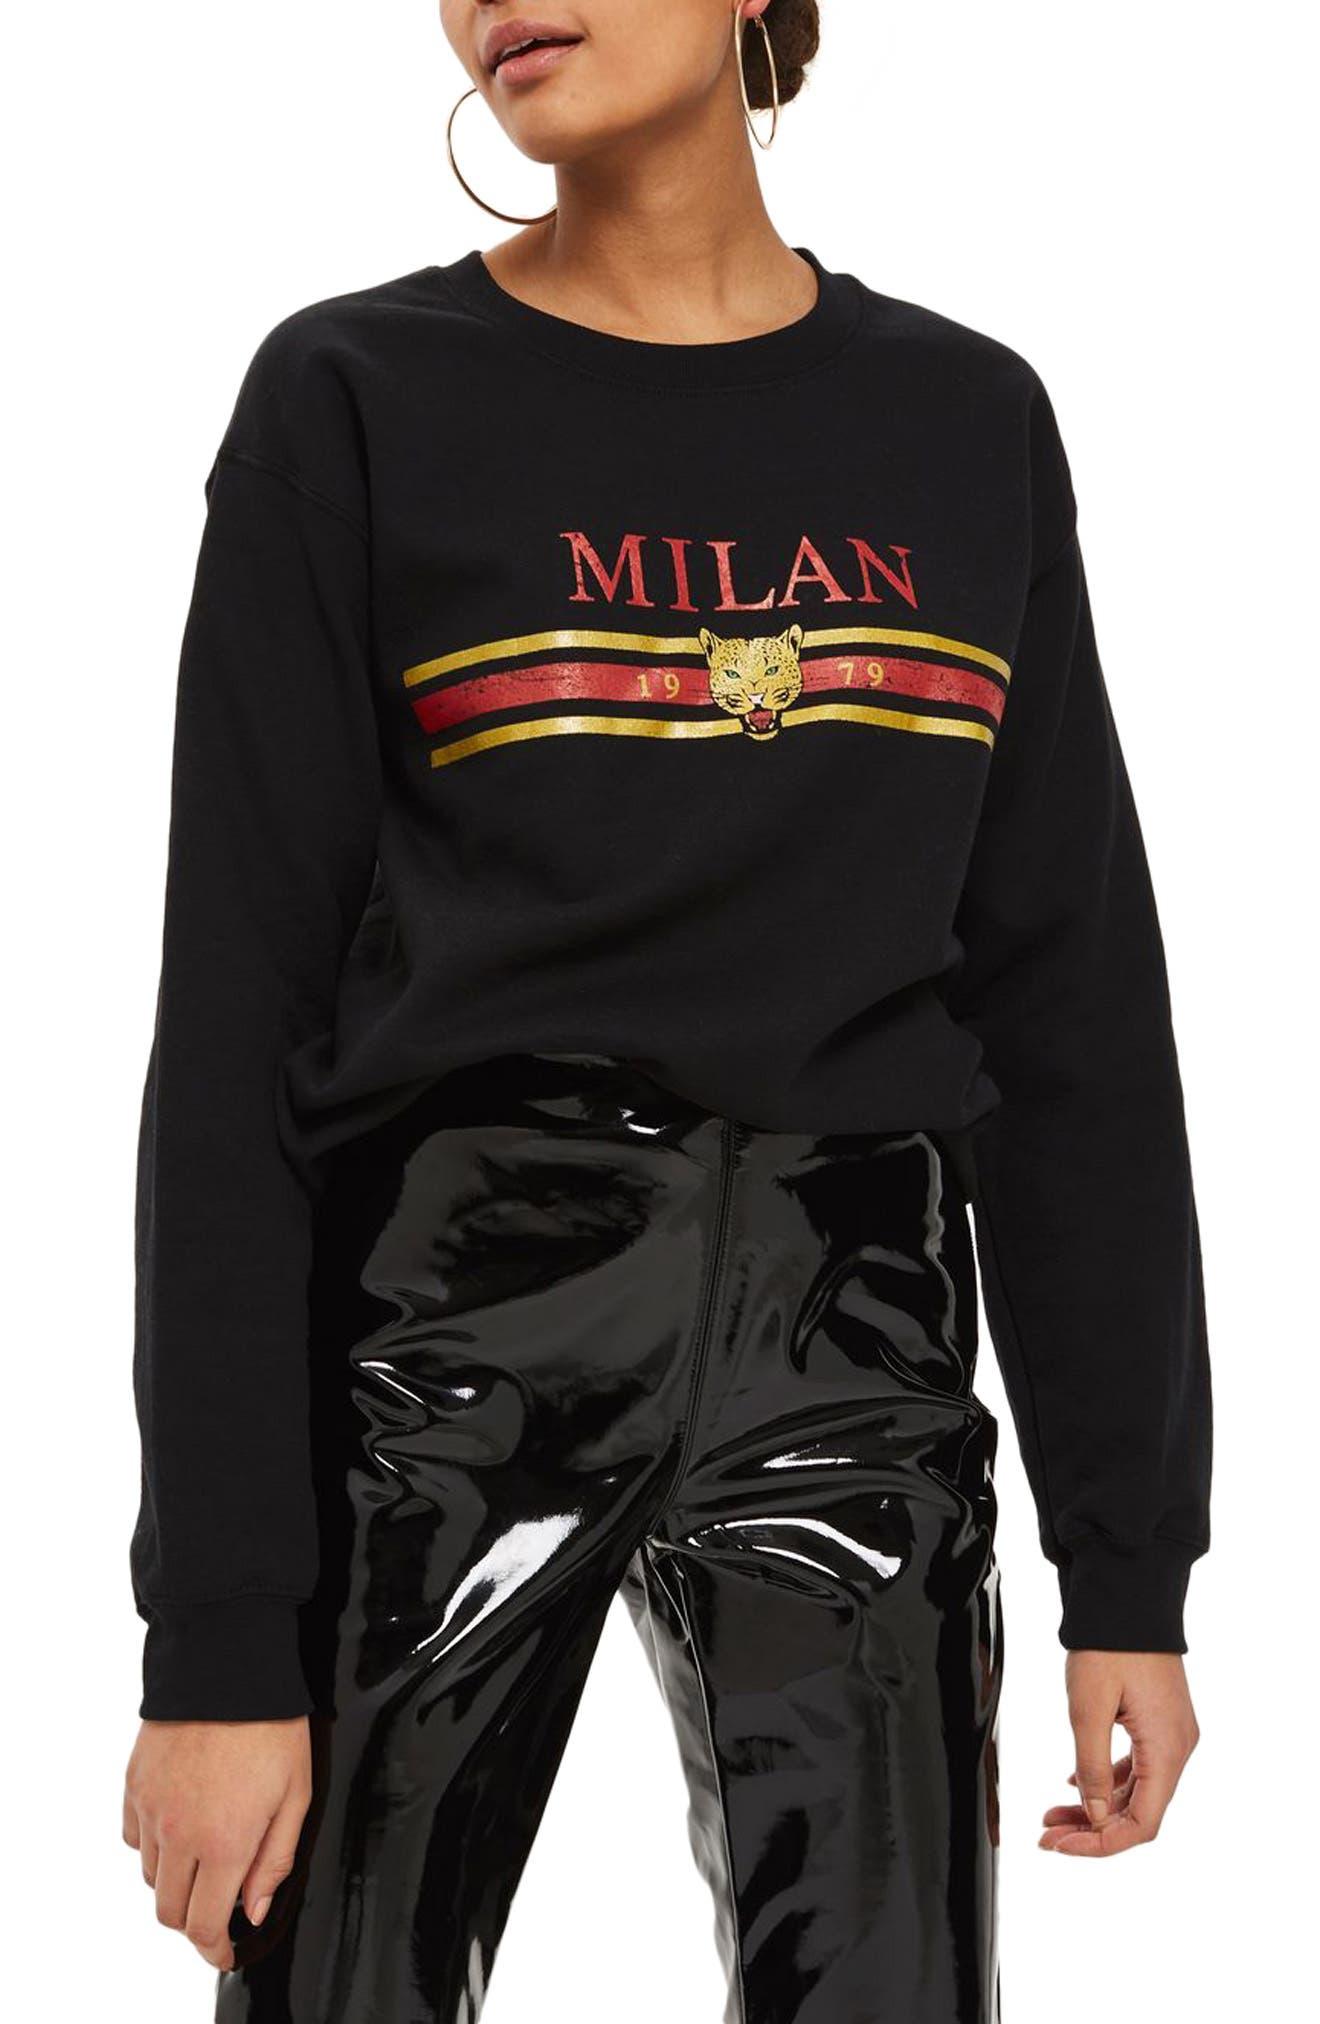 Milan Graphic Sweatshirt,                         Main,                         color, Black Multi